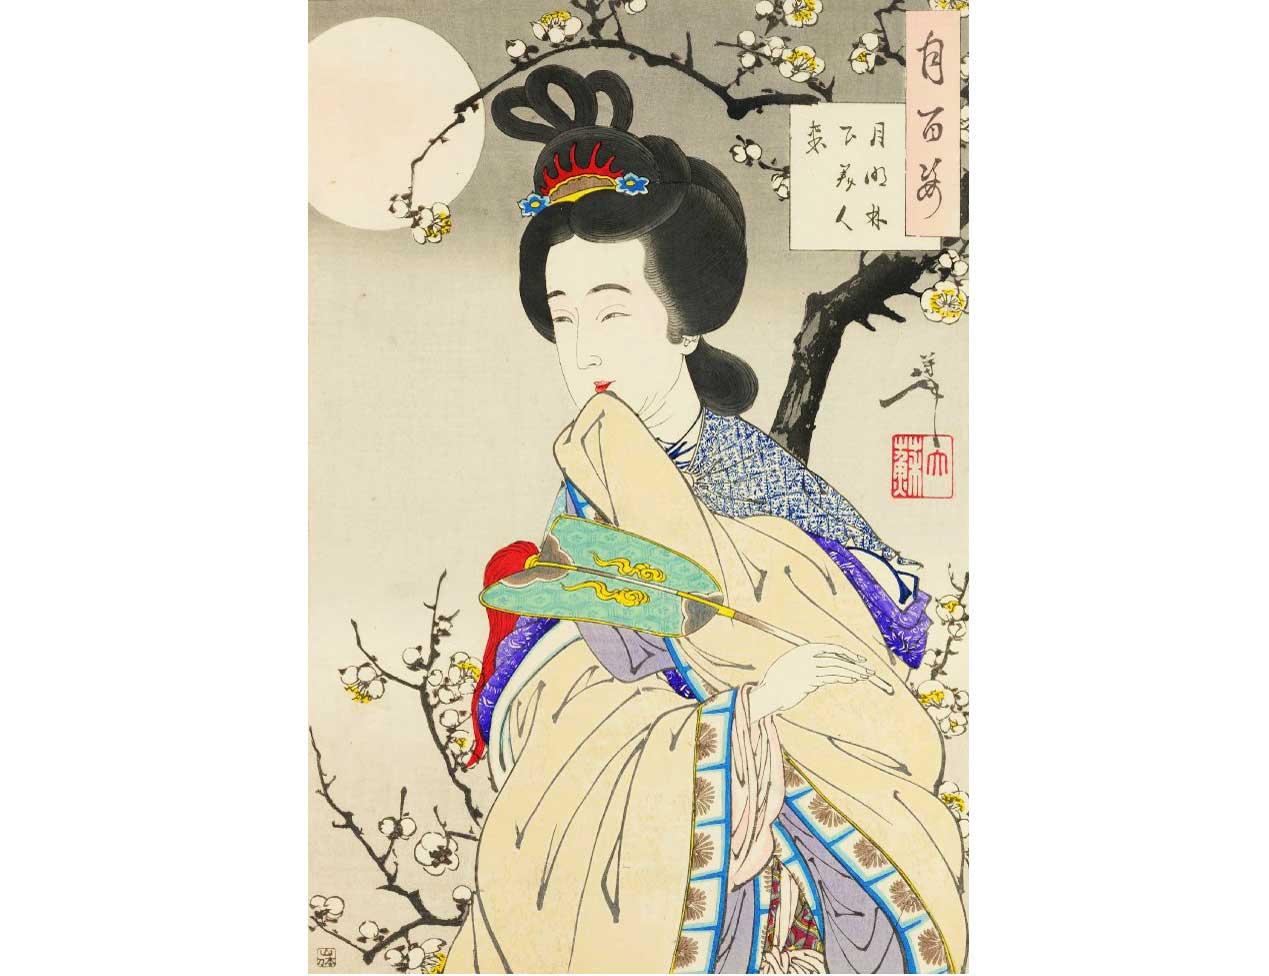 Spirit of the Plum Tree, Woodblock Print by Tsukioka Yoshitoshi , 1888